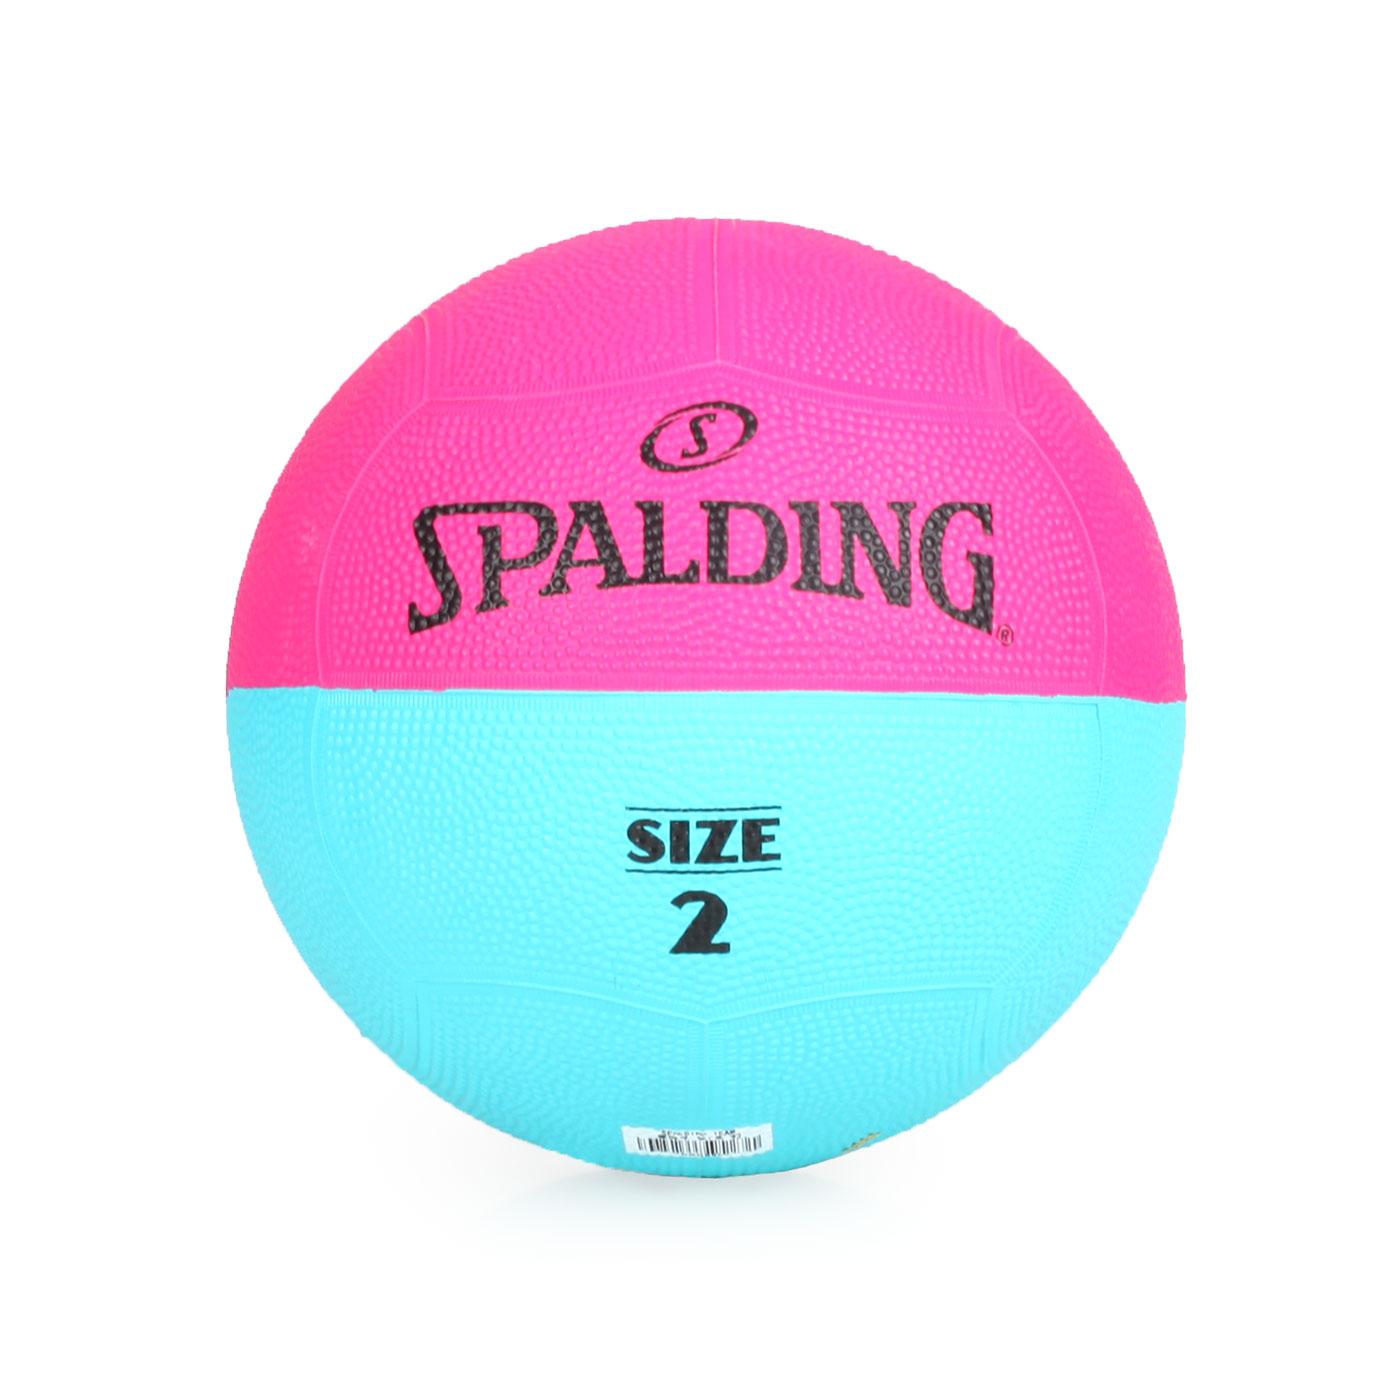 SPALDING Team 躲避球#2 SPBD2001 - 桃紅水藍